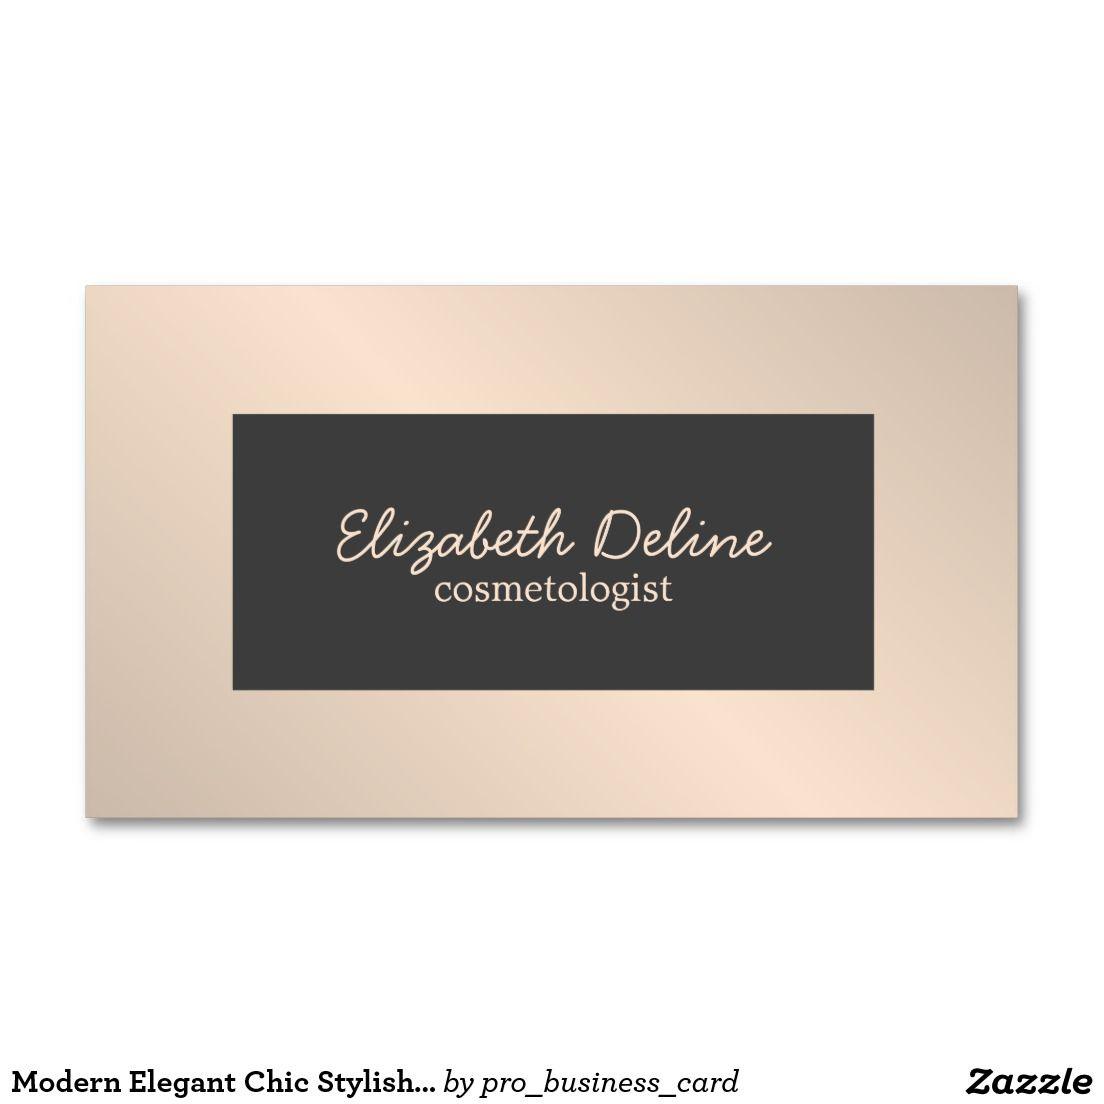 Modern Elegant Chic Stylish Cosmetologist Business Card | Business ...